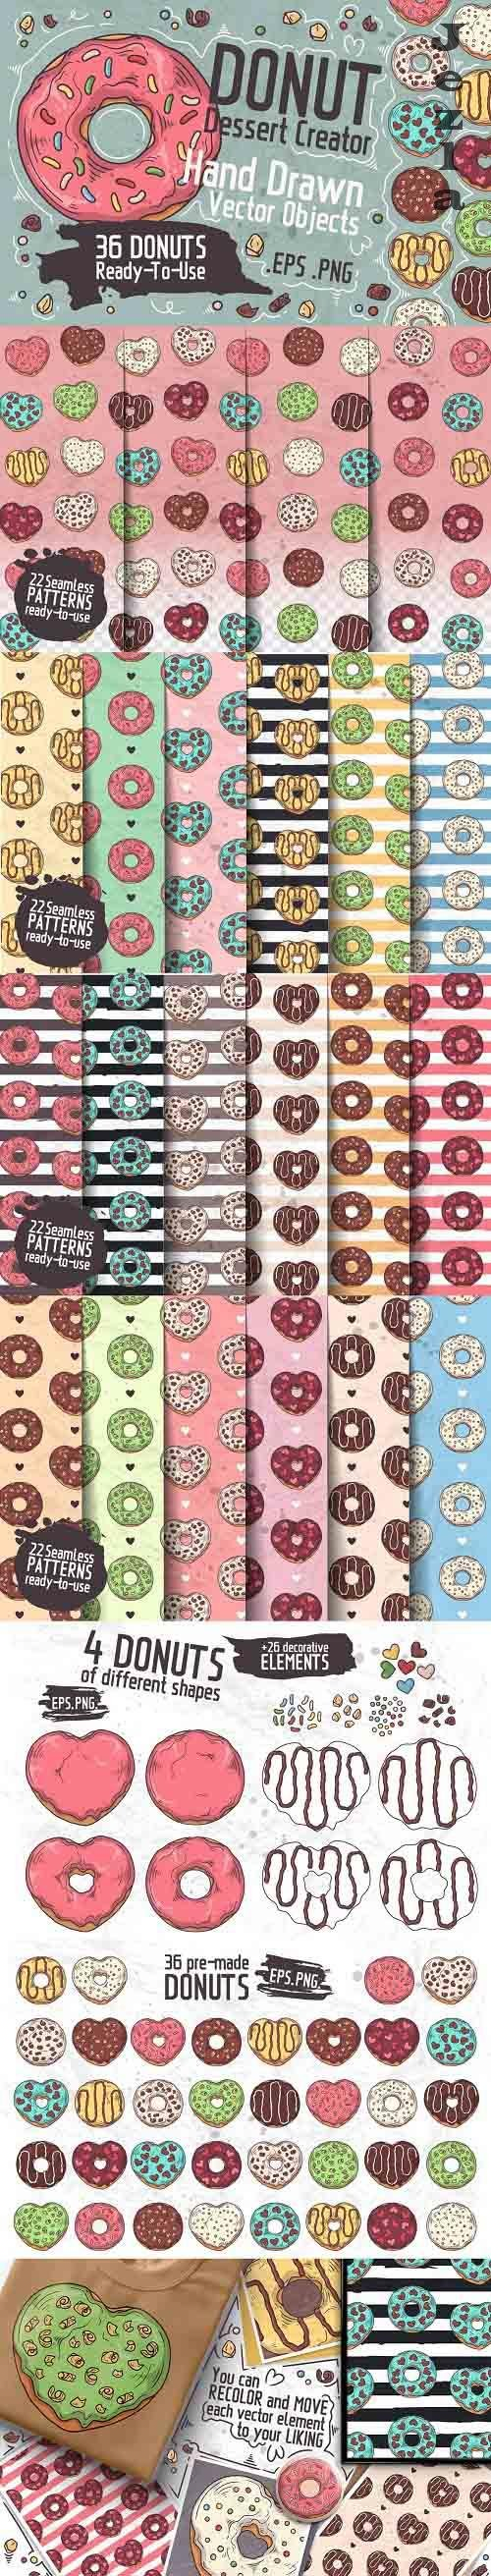 Donut Dessert Creator - 1345925